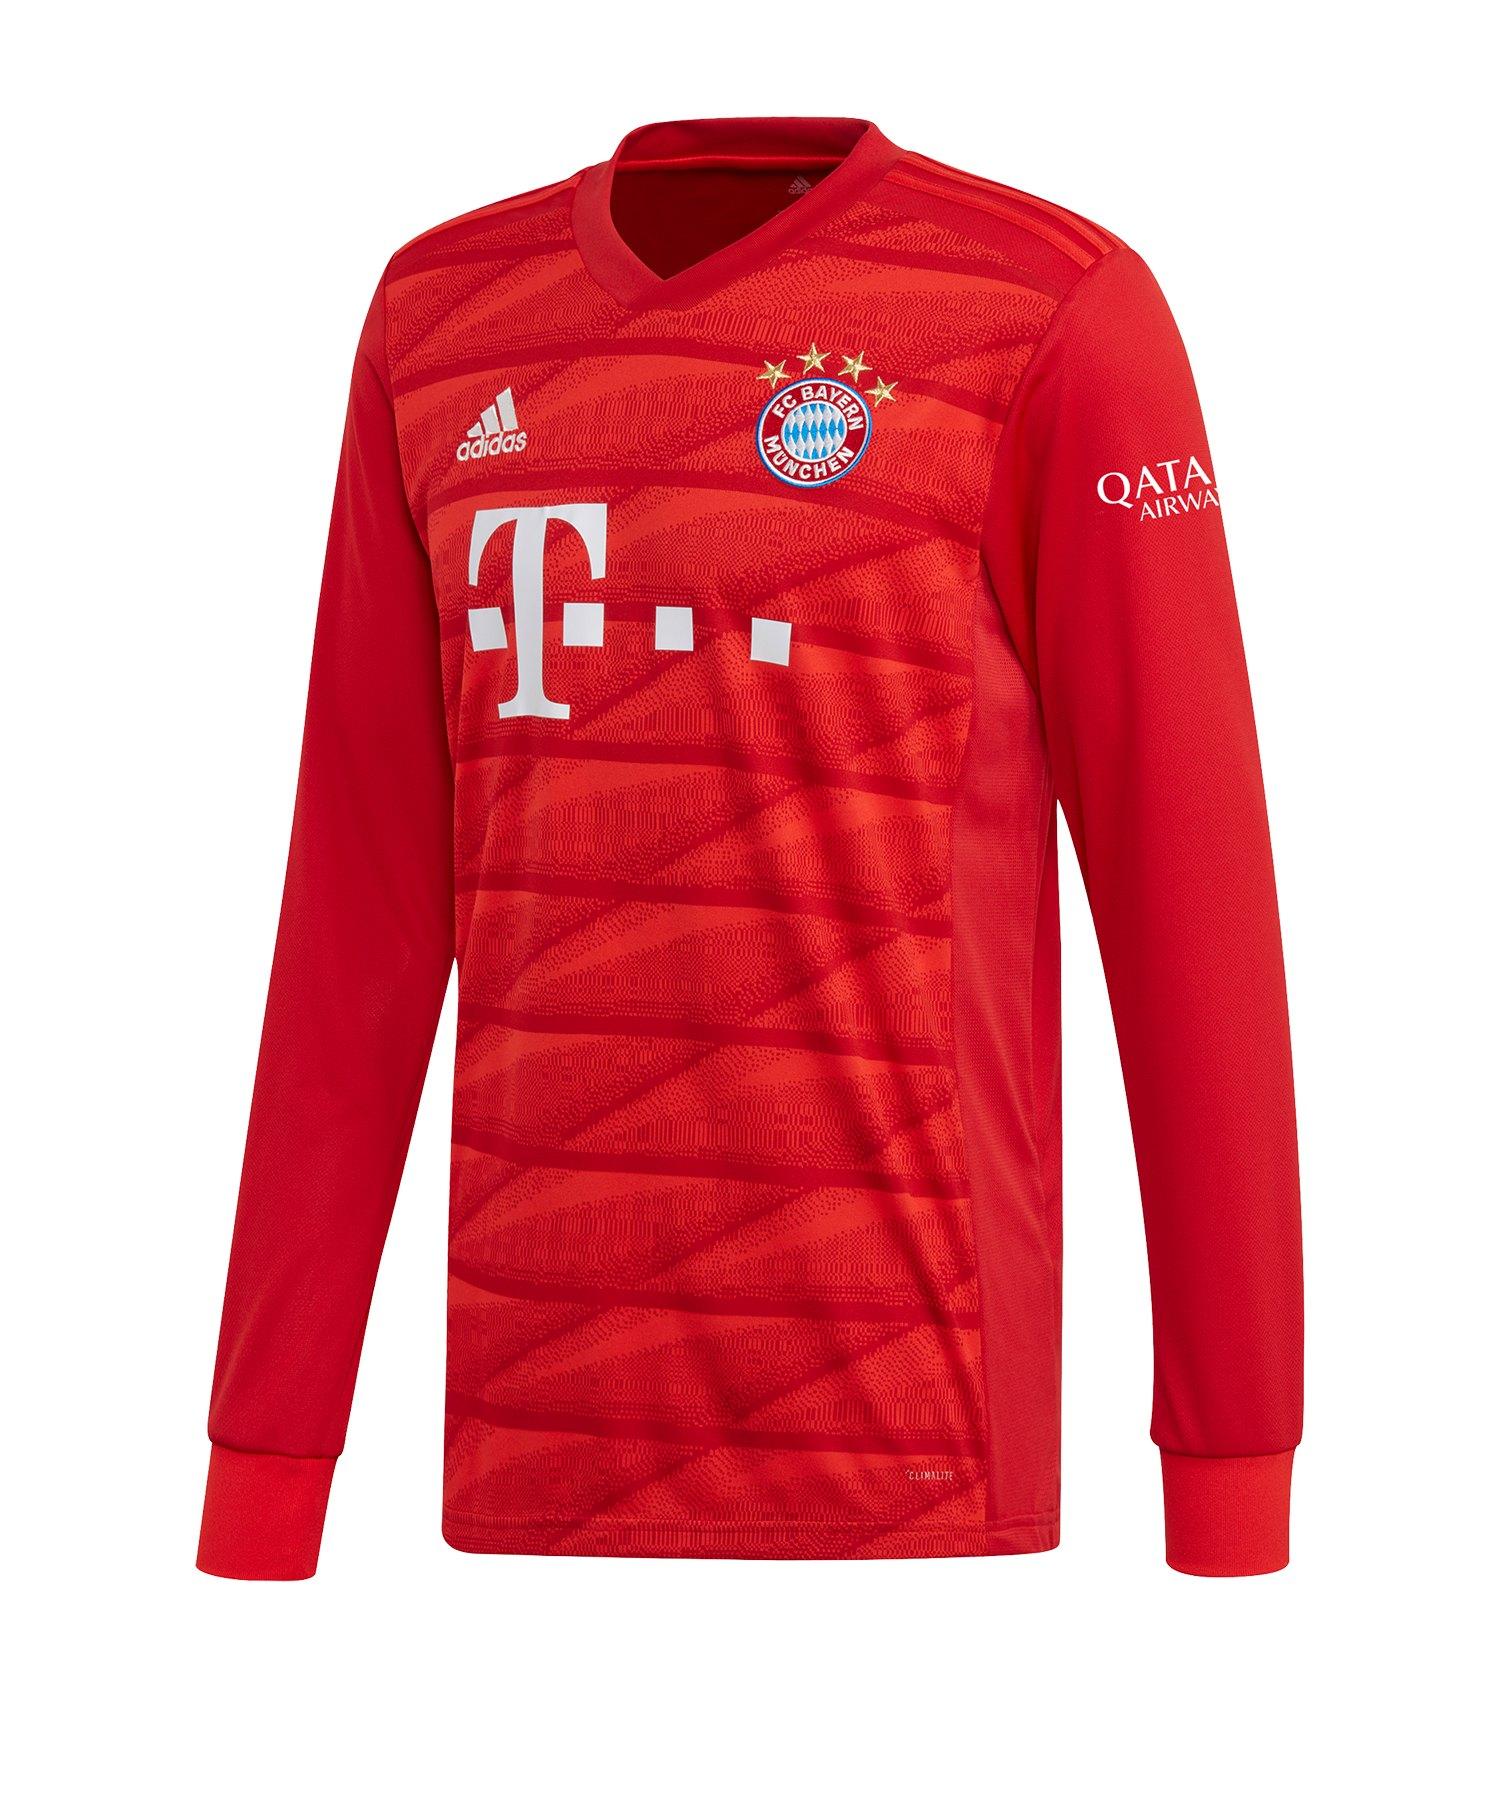 c62de254ed adidas FC Bayern München Trikot Home LA 2019/2020 |Replicas ...